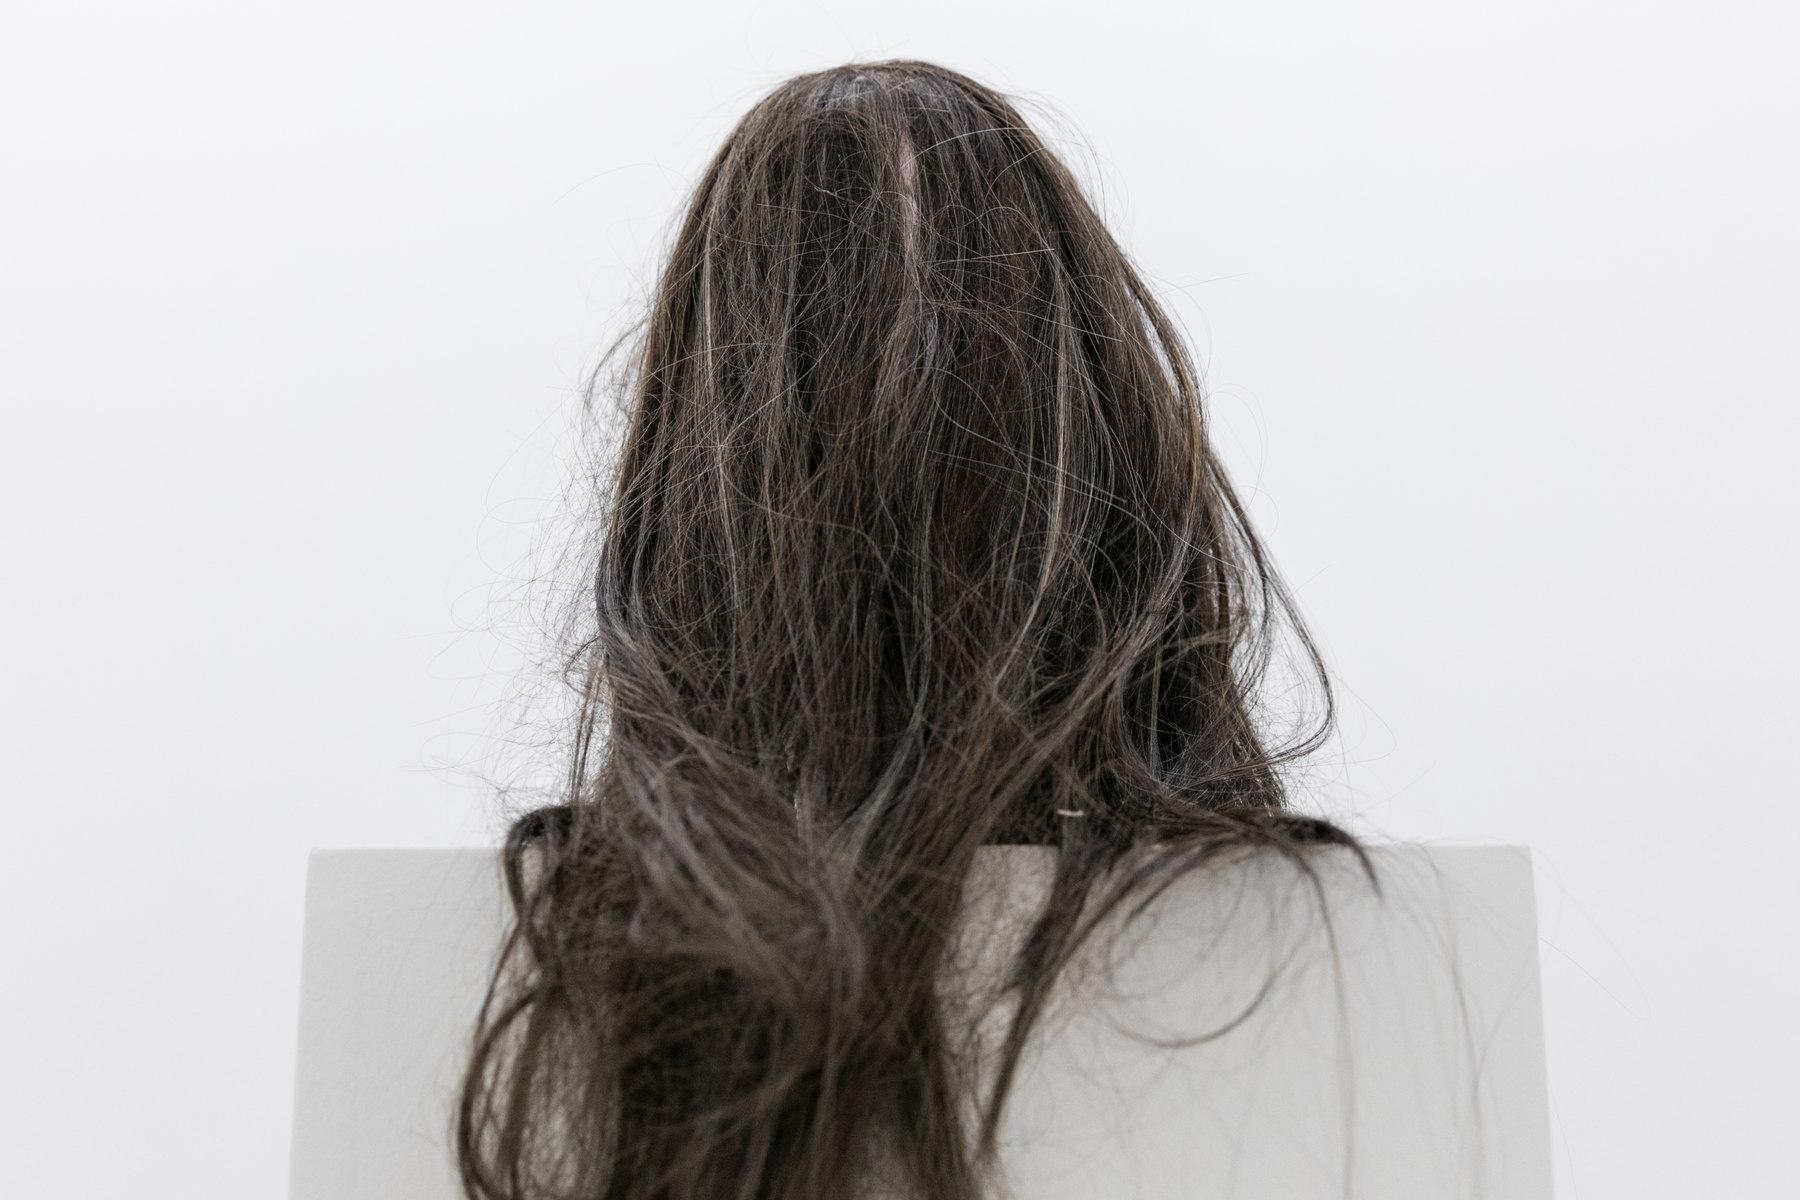 © Gianluca Di Ioia - La Triennale-16